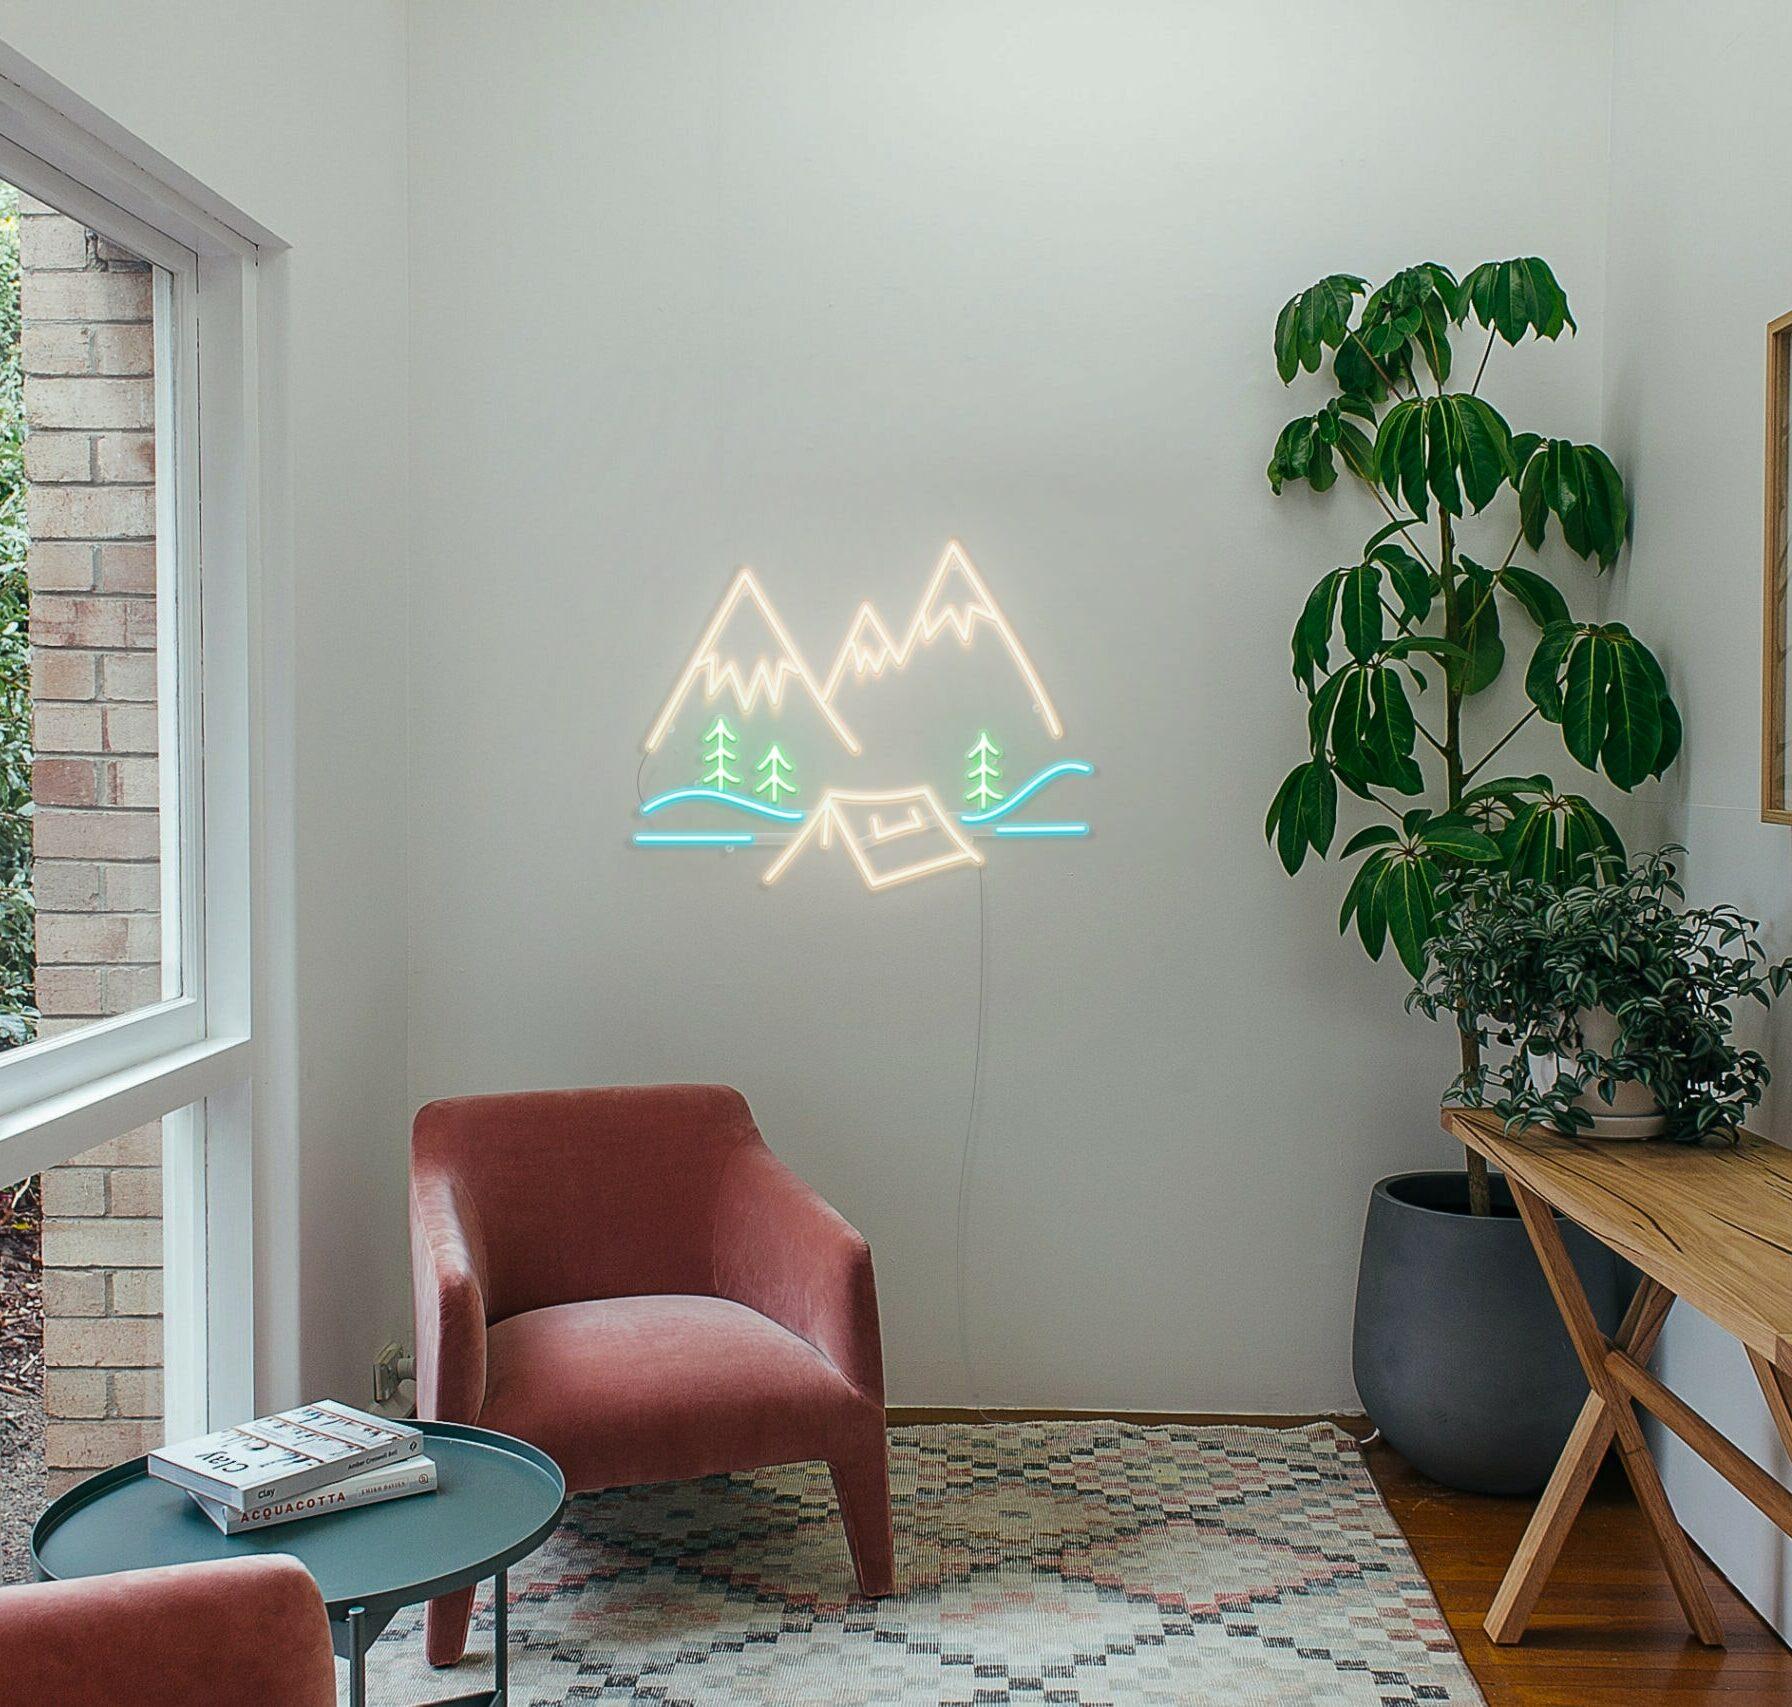 camping neon light